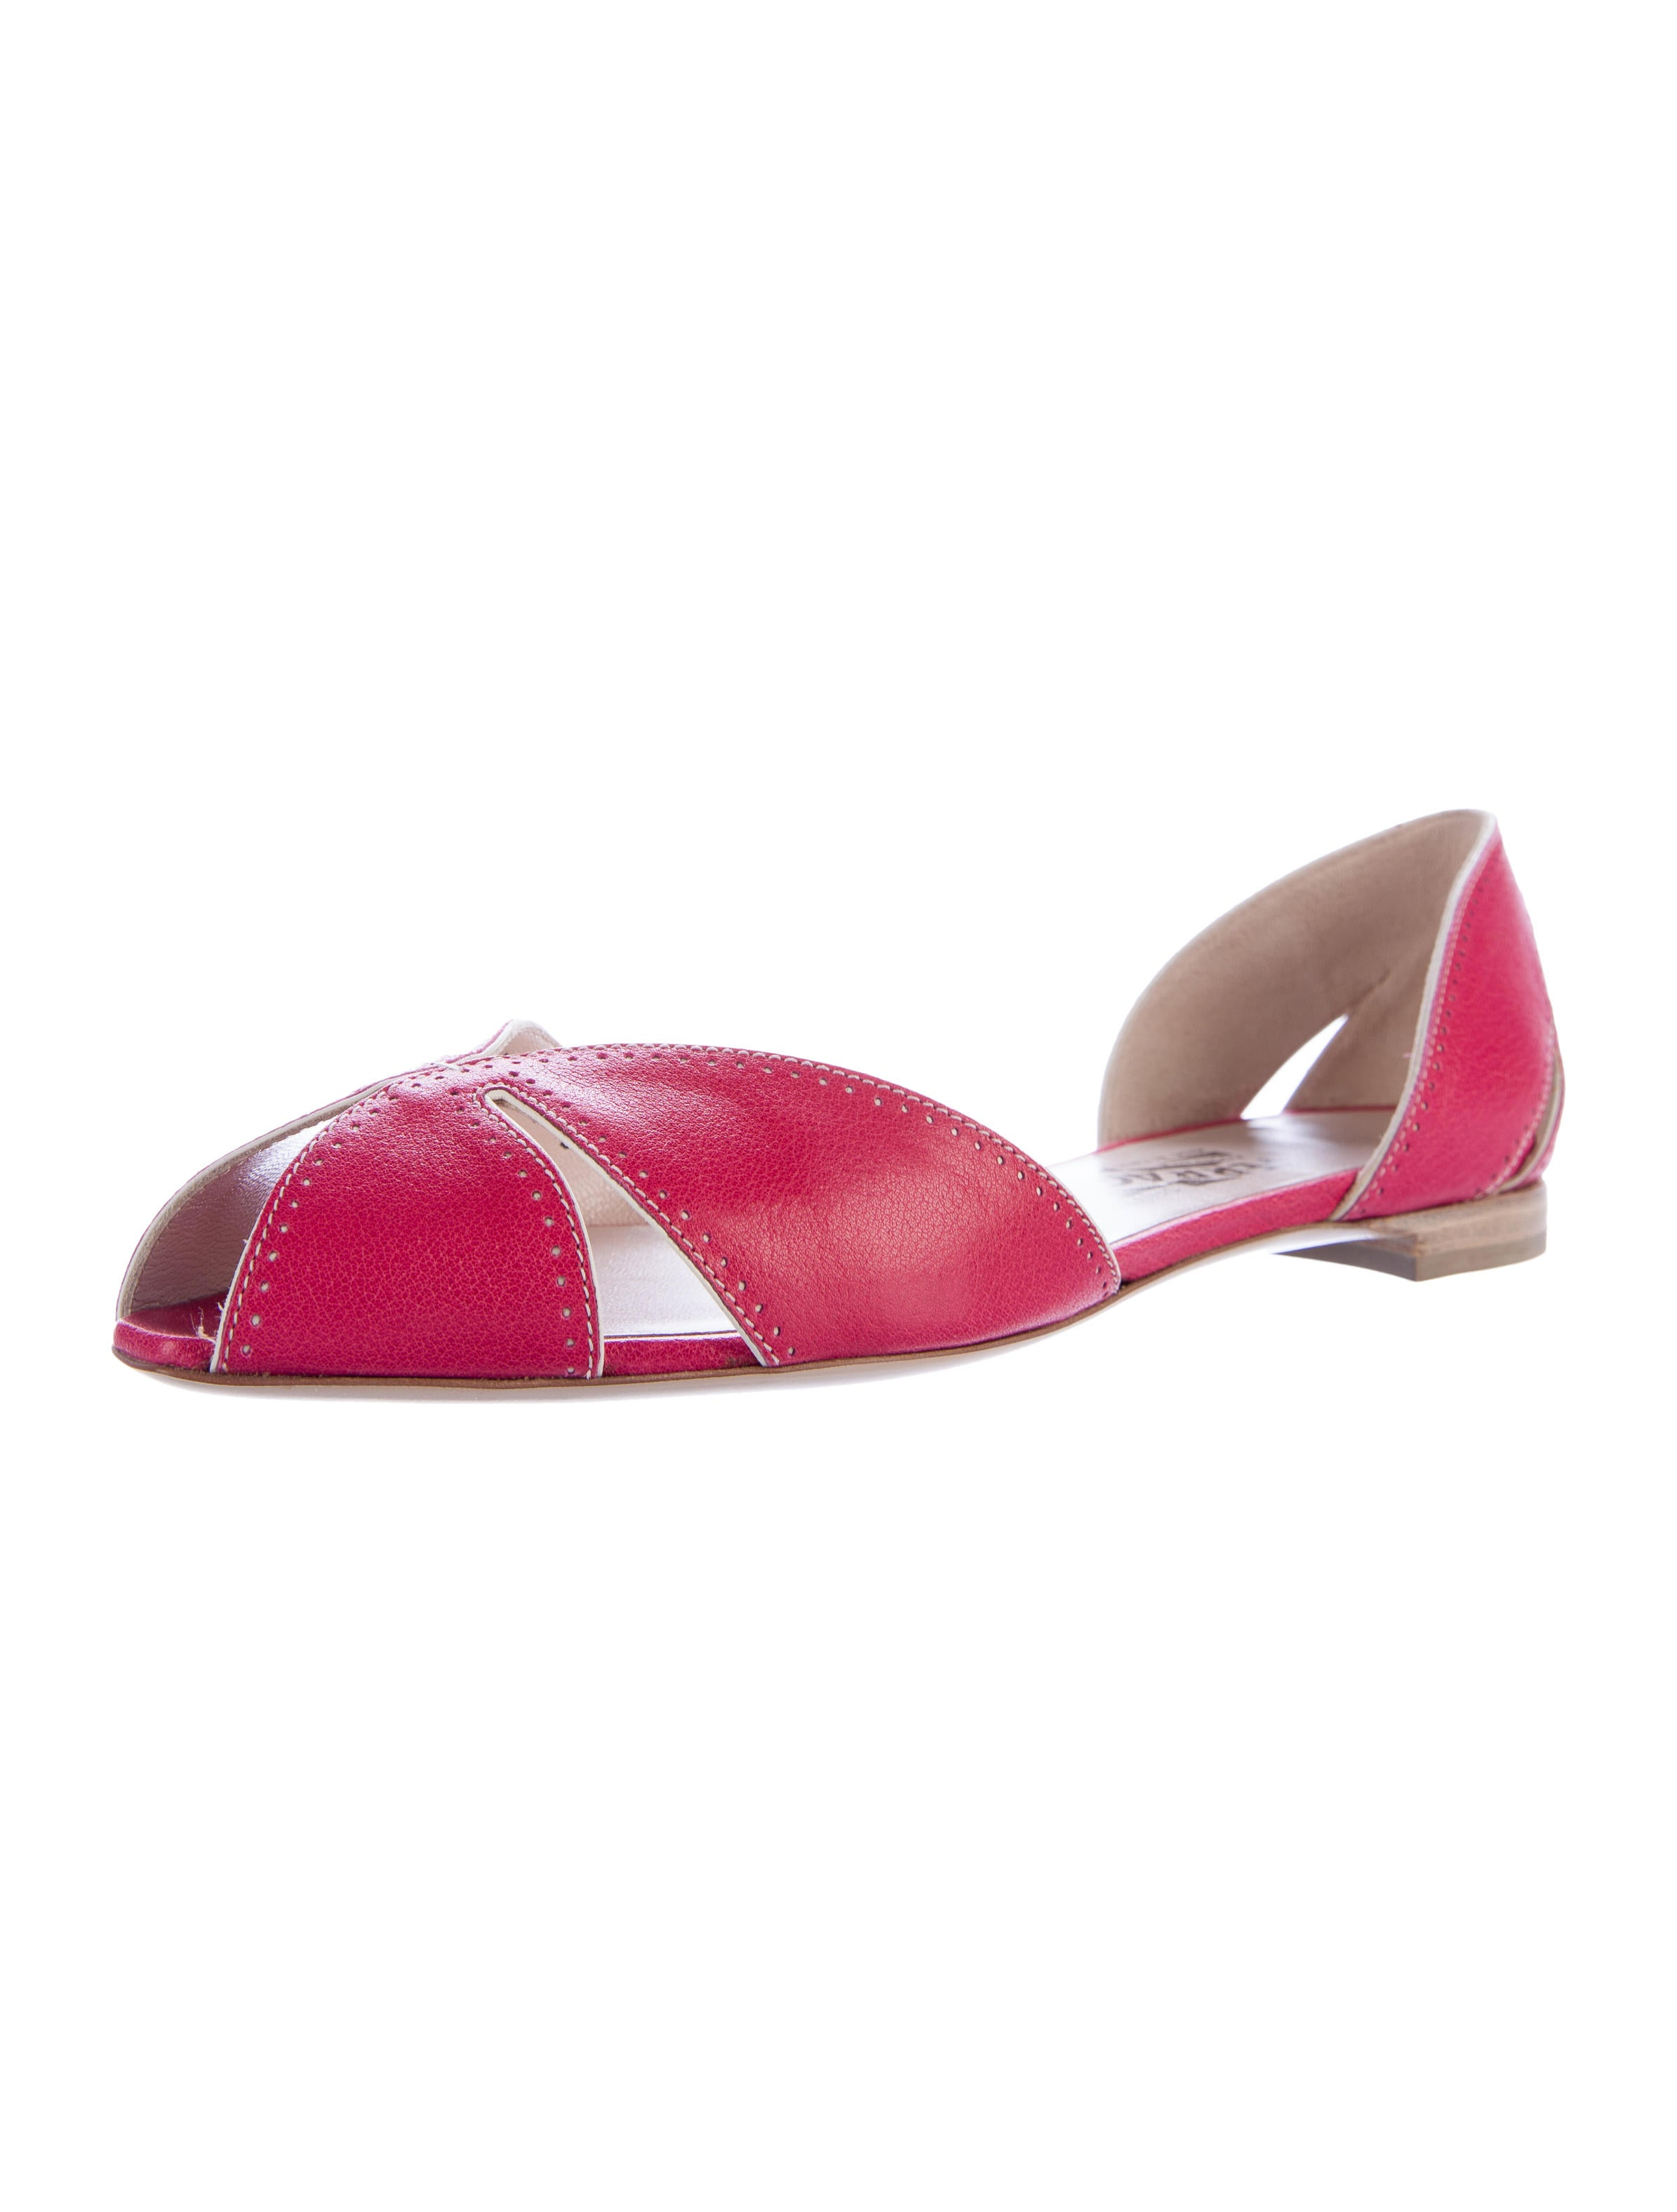 Salvatore Ferragamo Mammola Peep-Toe Flats w\/ Tags - Shoes ...